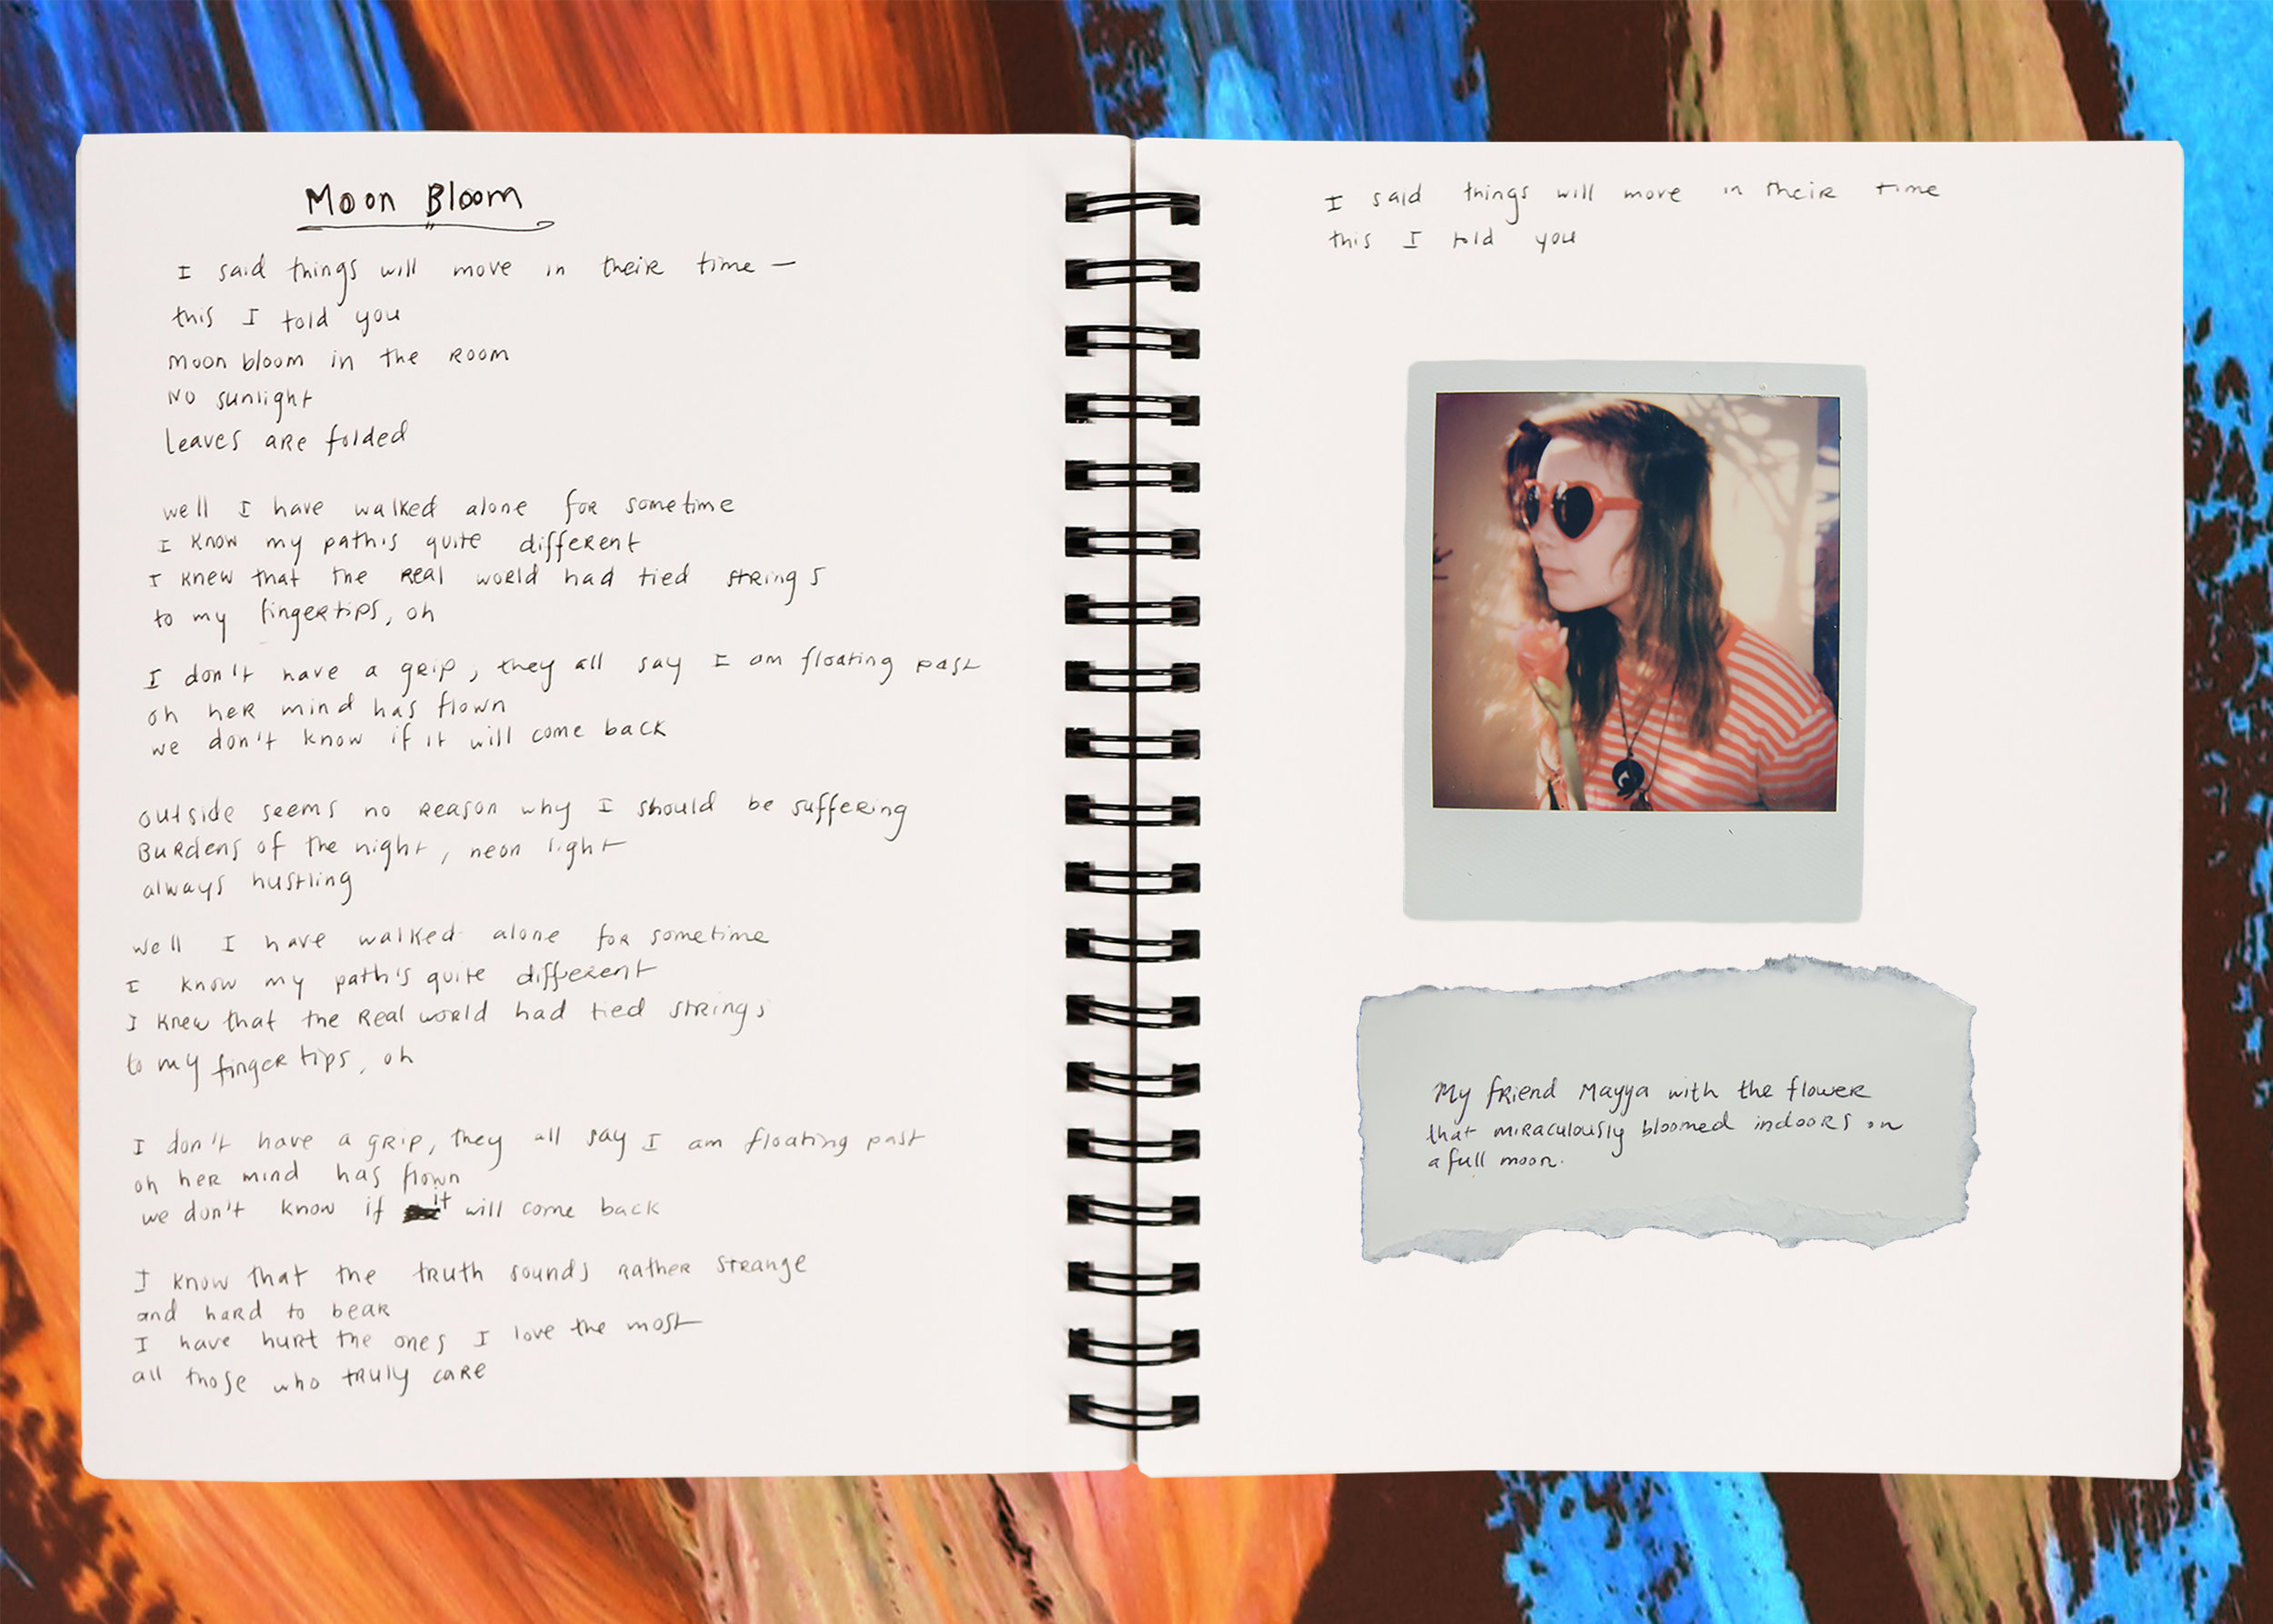 Moonbloom Lyrics bigger.jpg